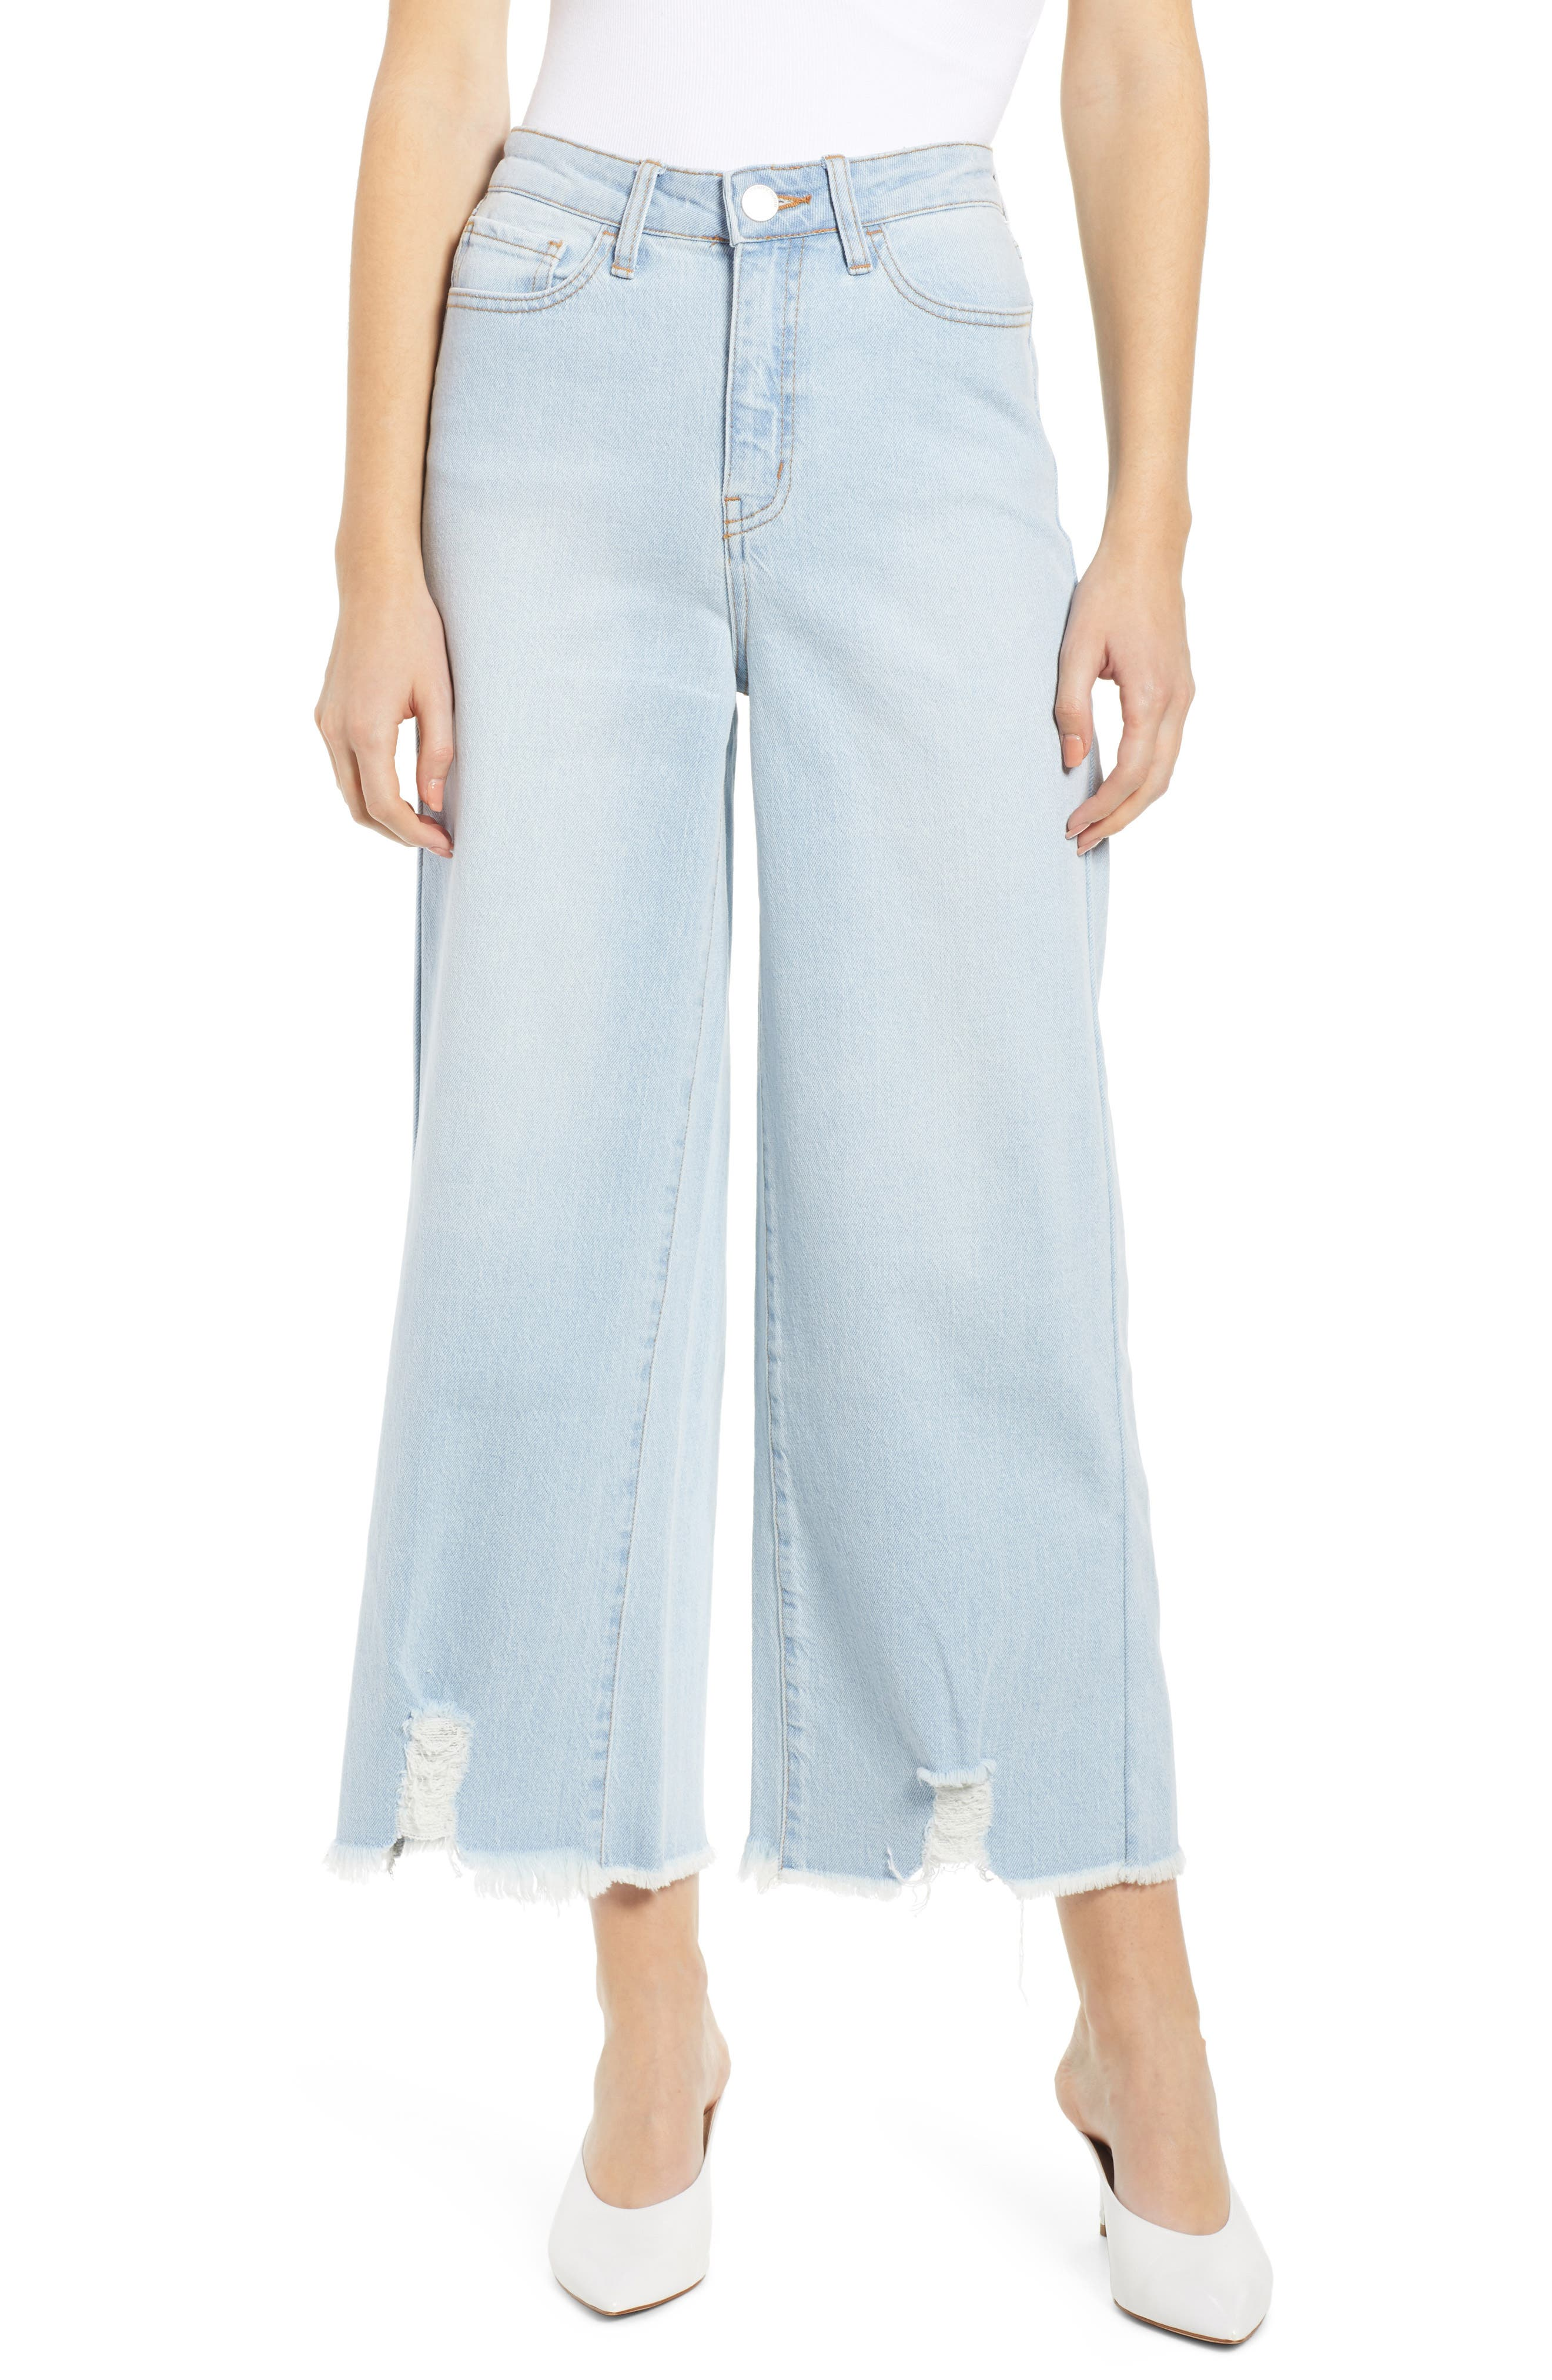 PROSPERITY DENIM, Fray Hem Wide Leg Crop Jeans, Main thumbnail 1, color, LIGHT WASH